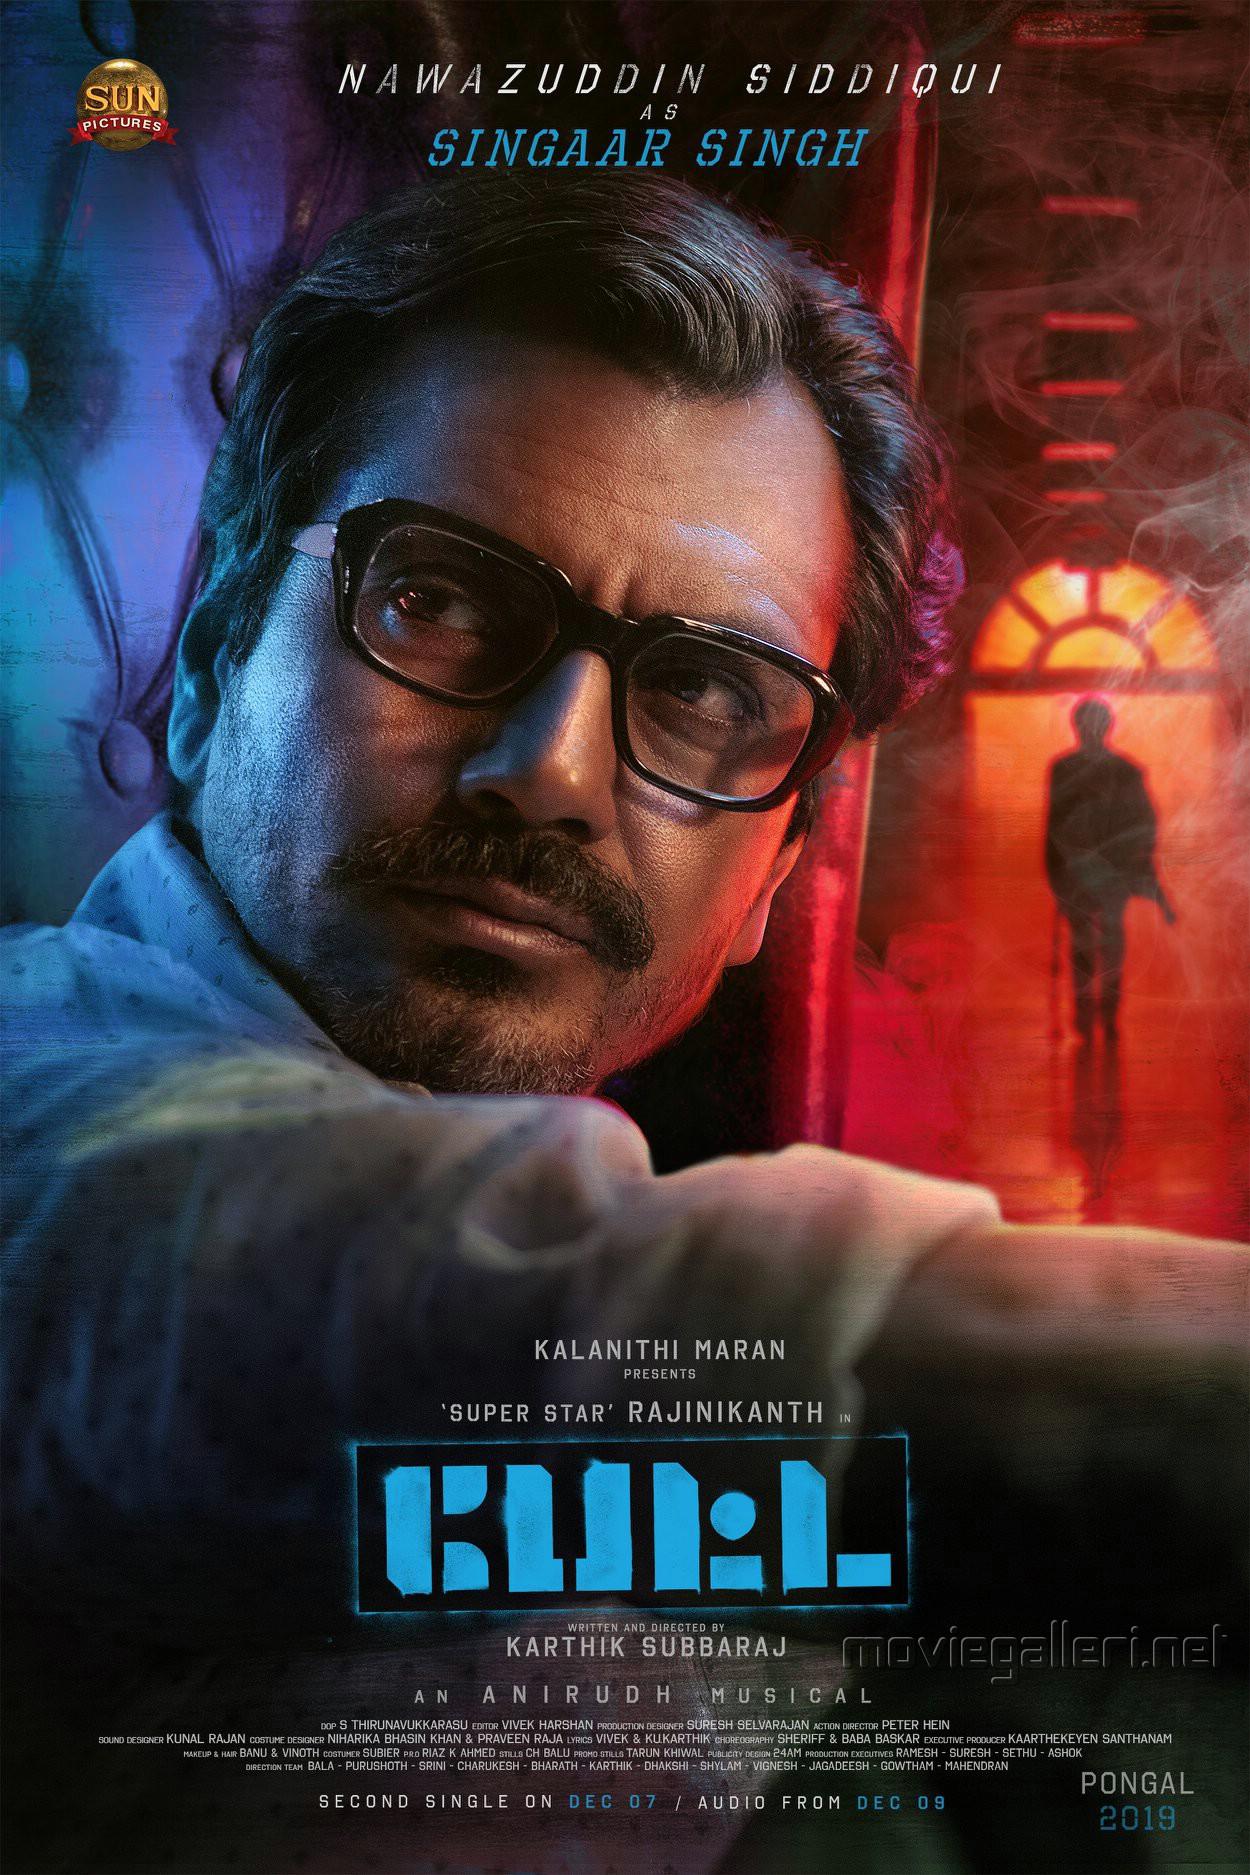 Actor Nawazuddin Siddiqui as Singaar Singh in Petta Movie Poster HD